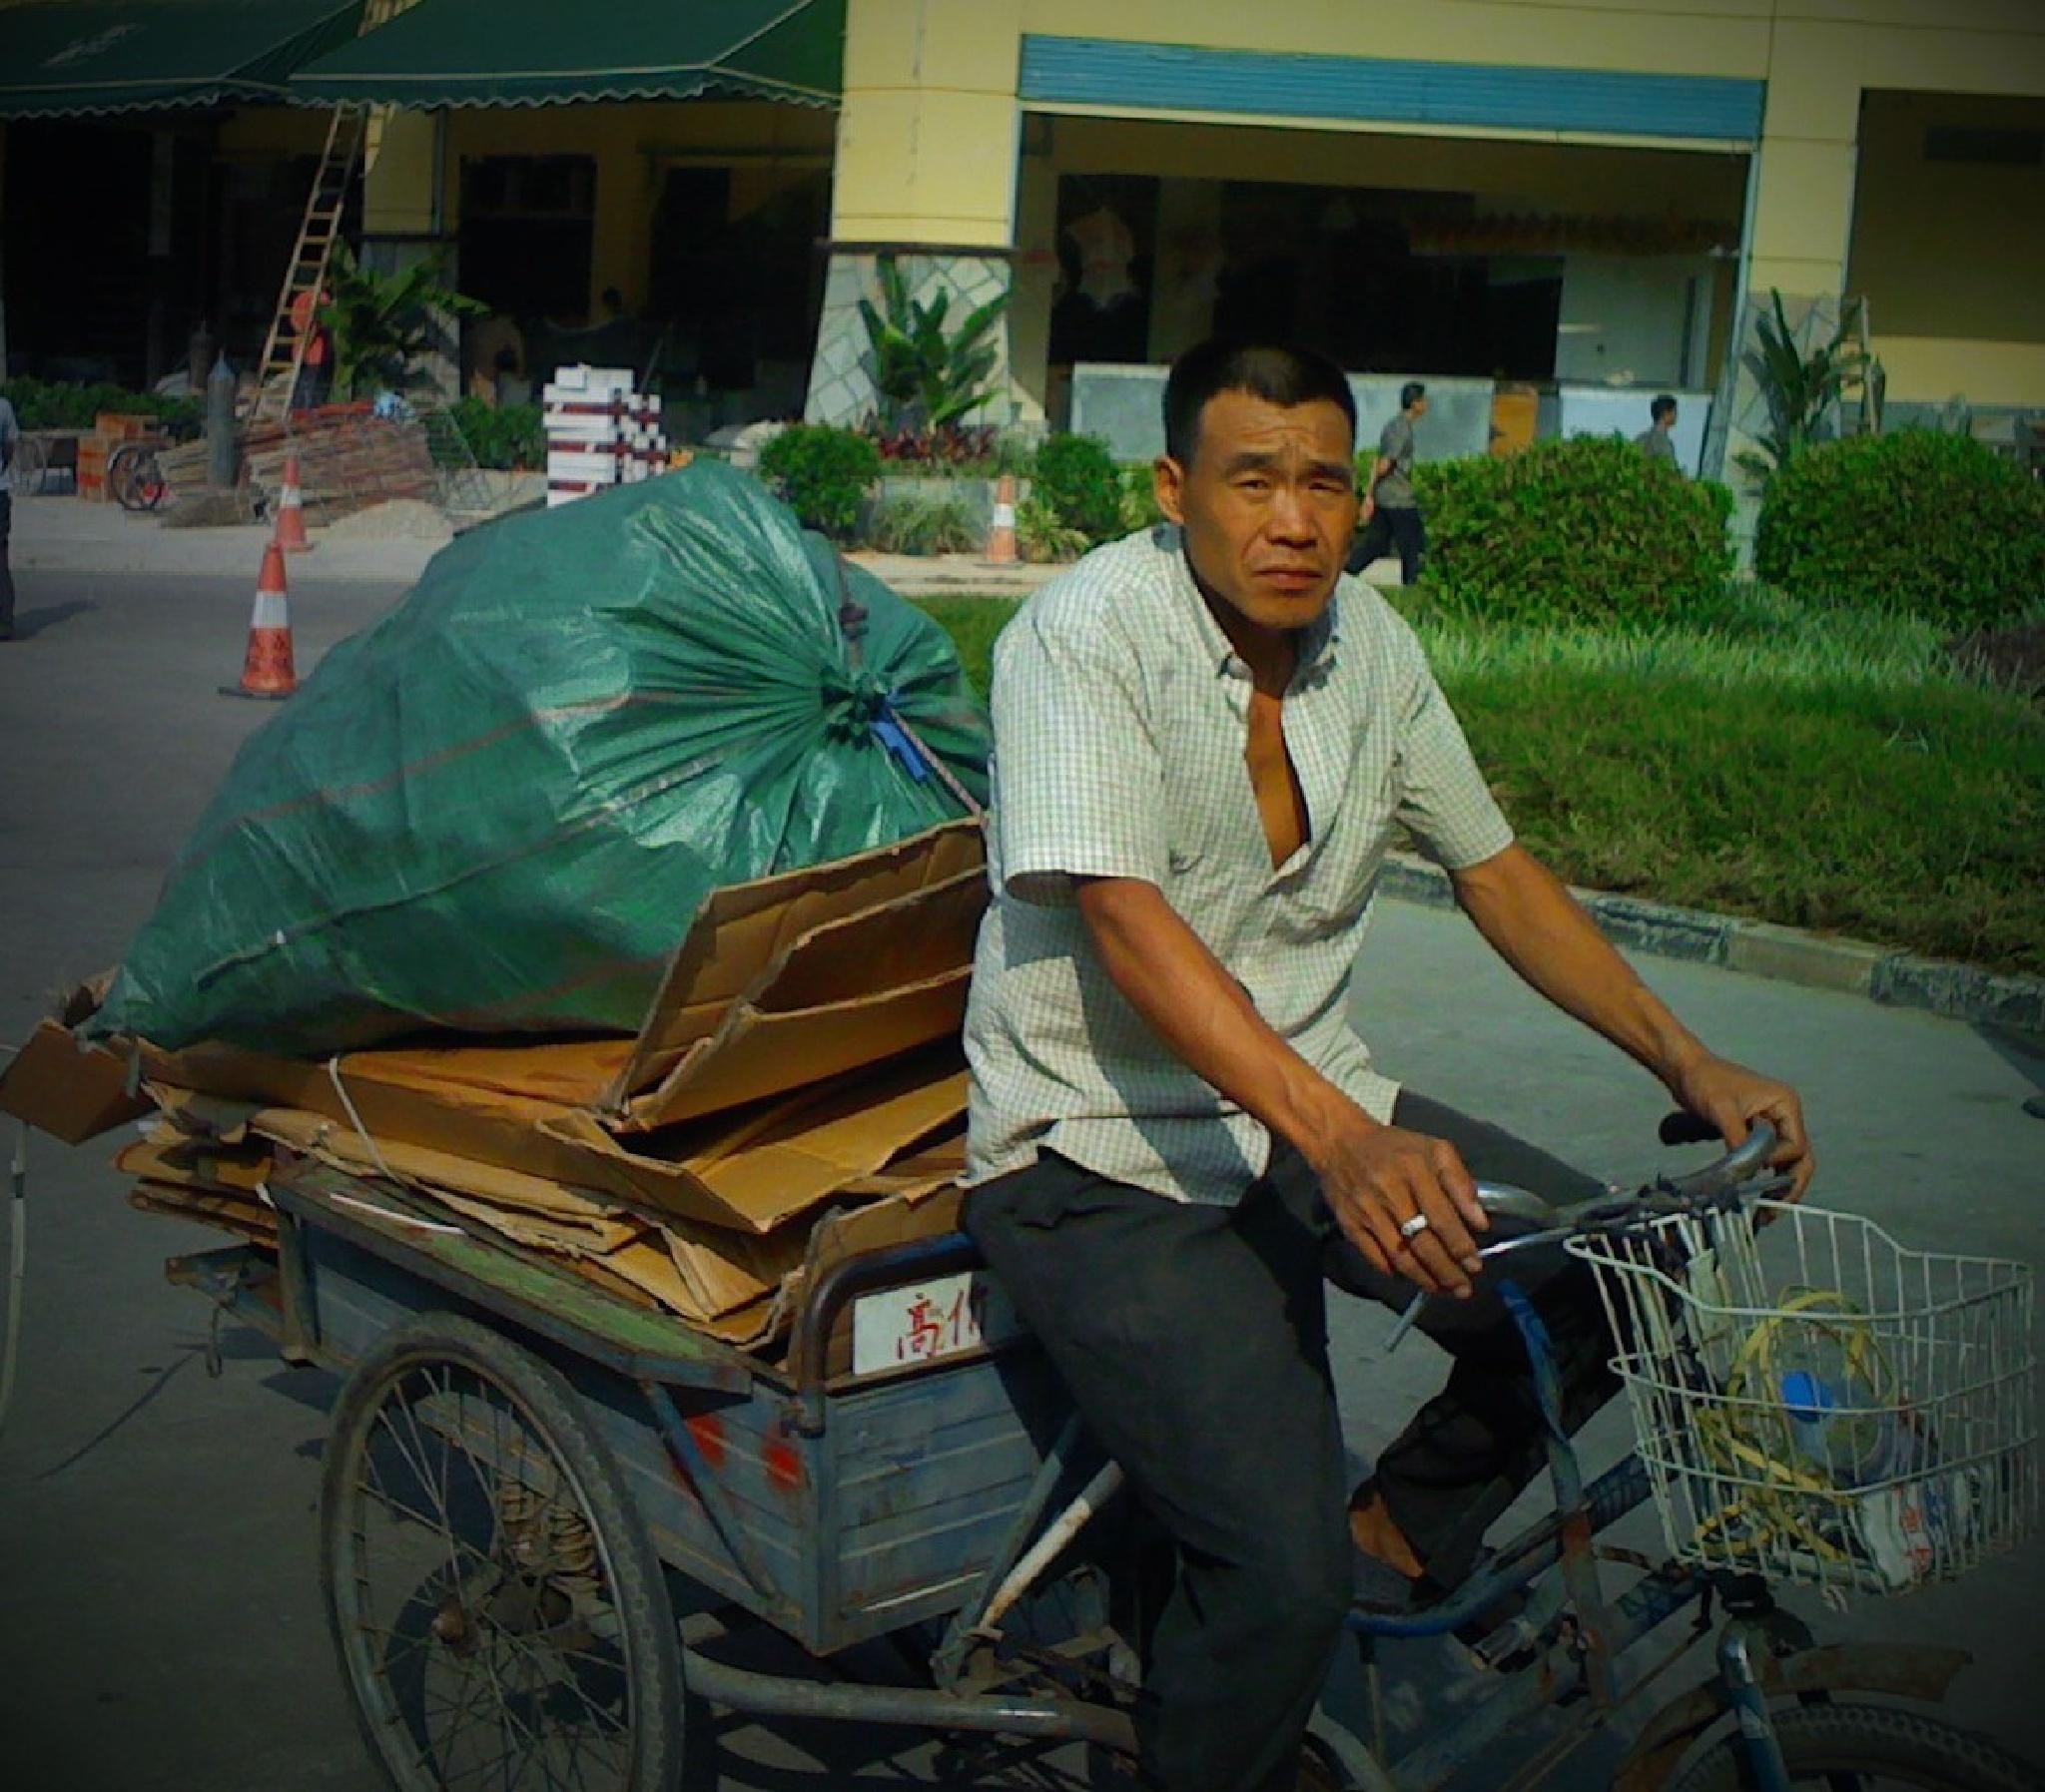 Street Life Shenzhen, China by LornaWLittrell